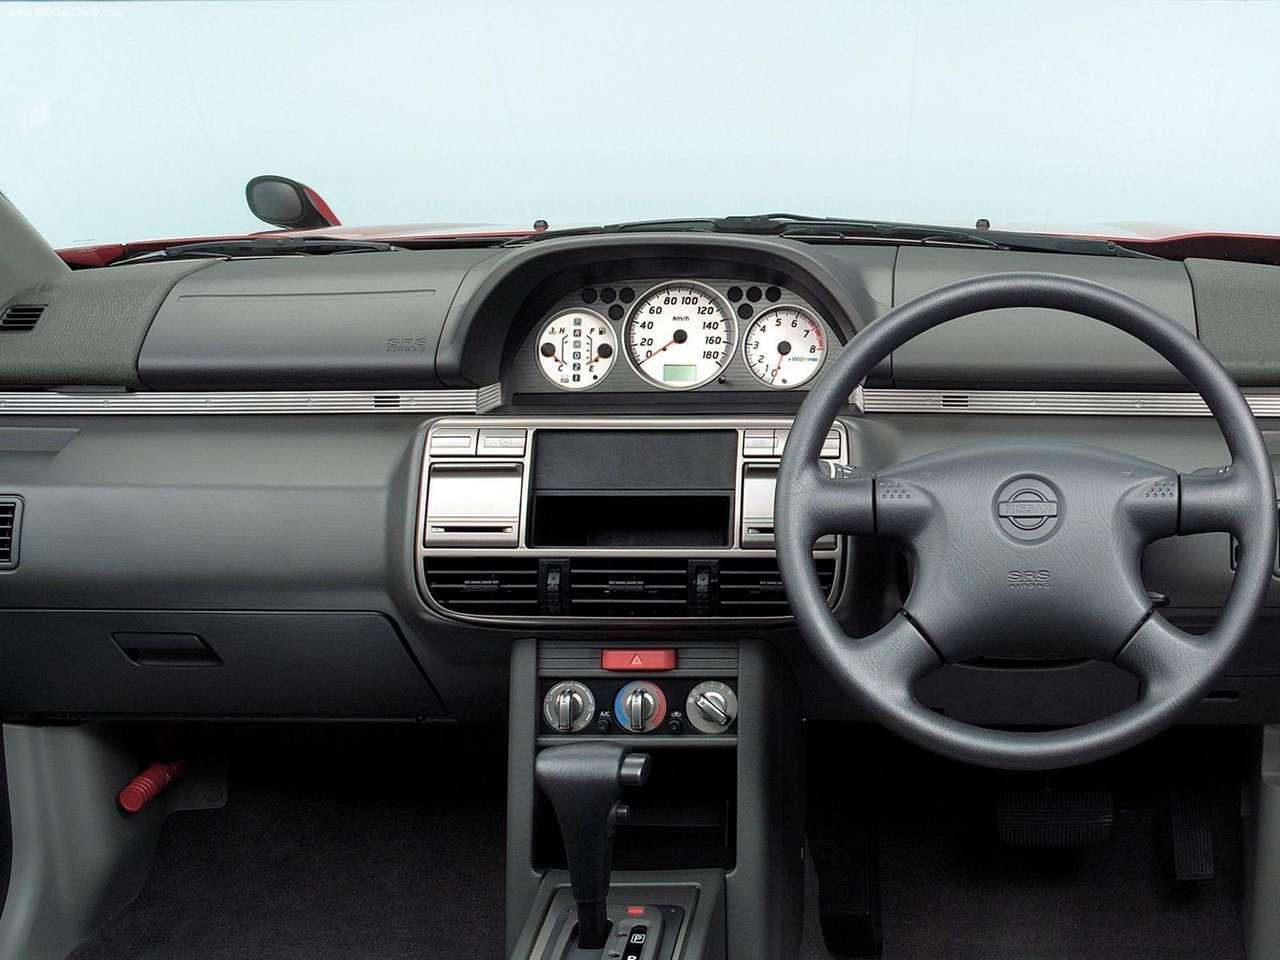 2002 Nissan Xtrail S